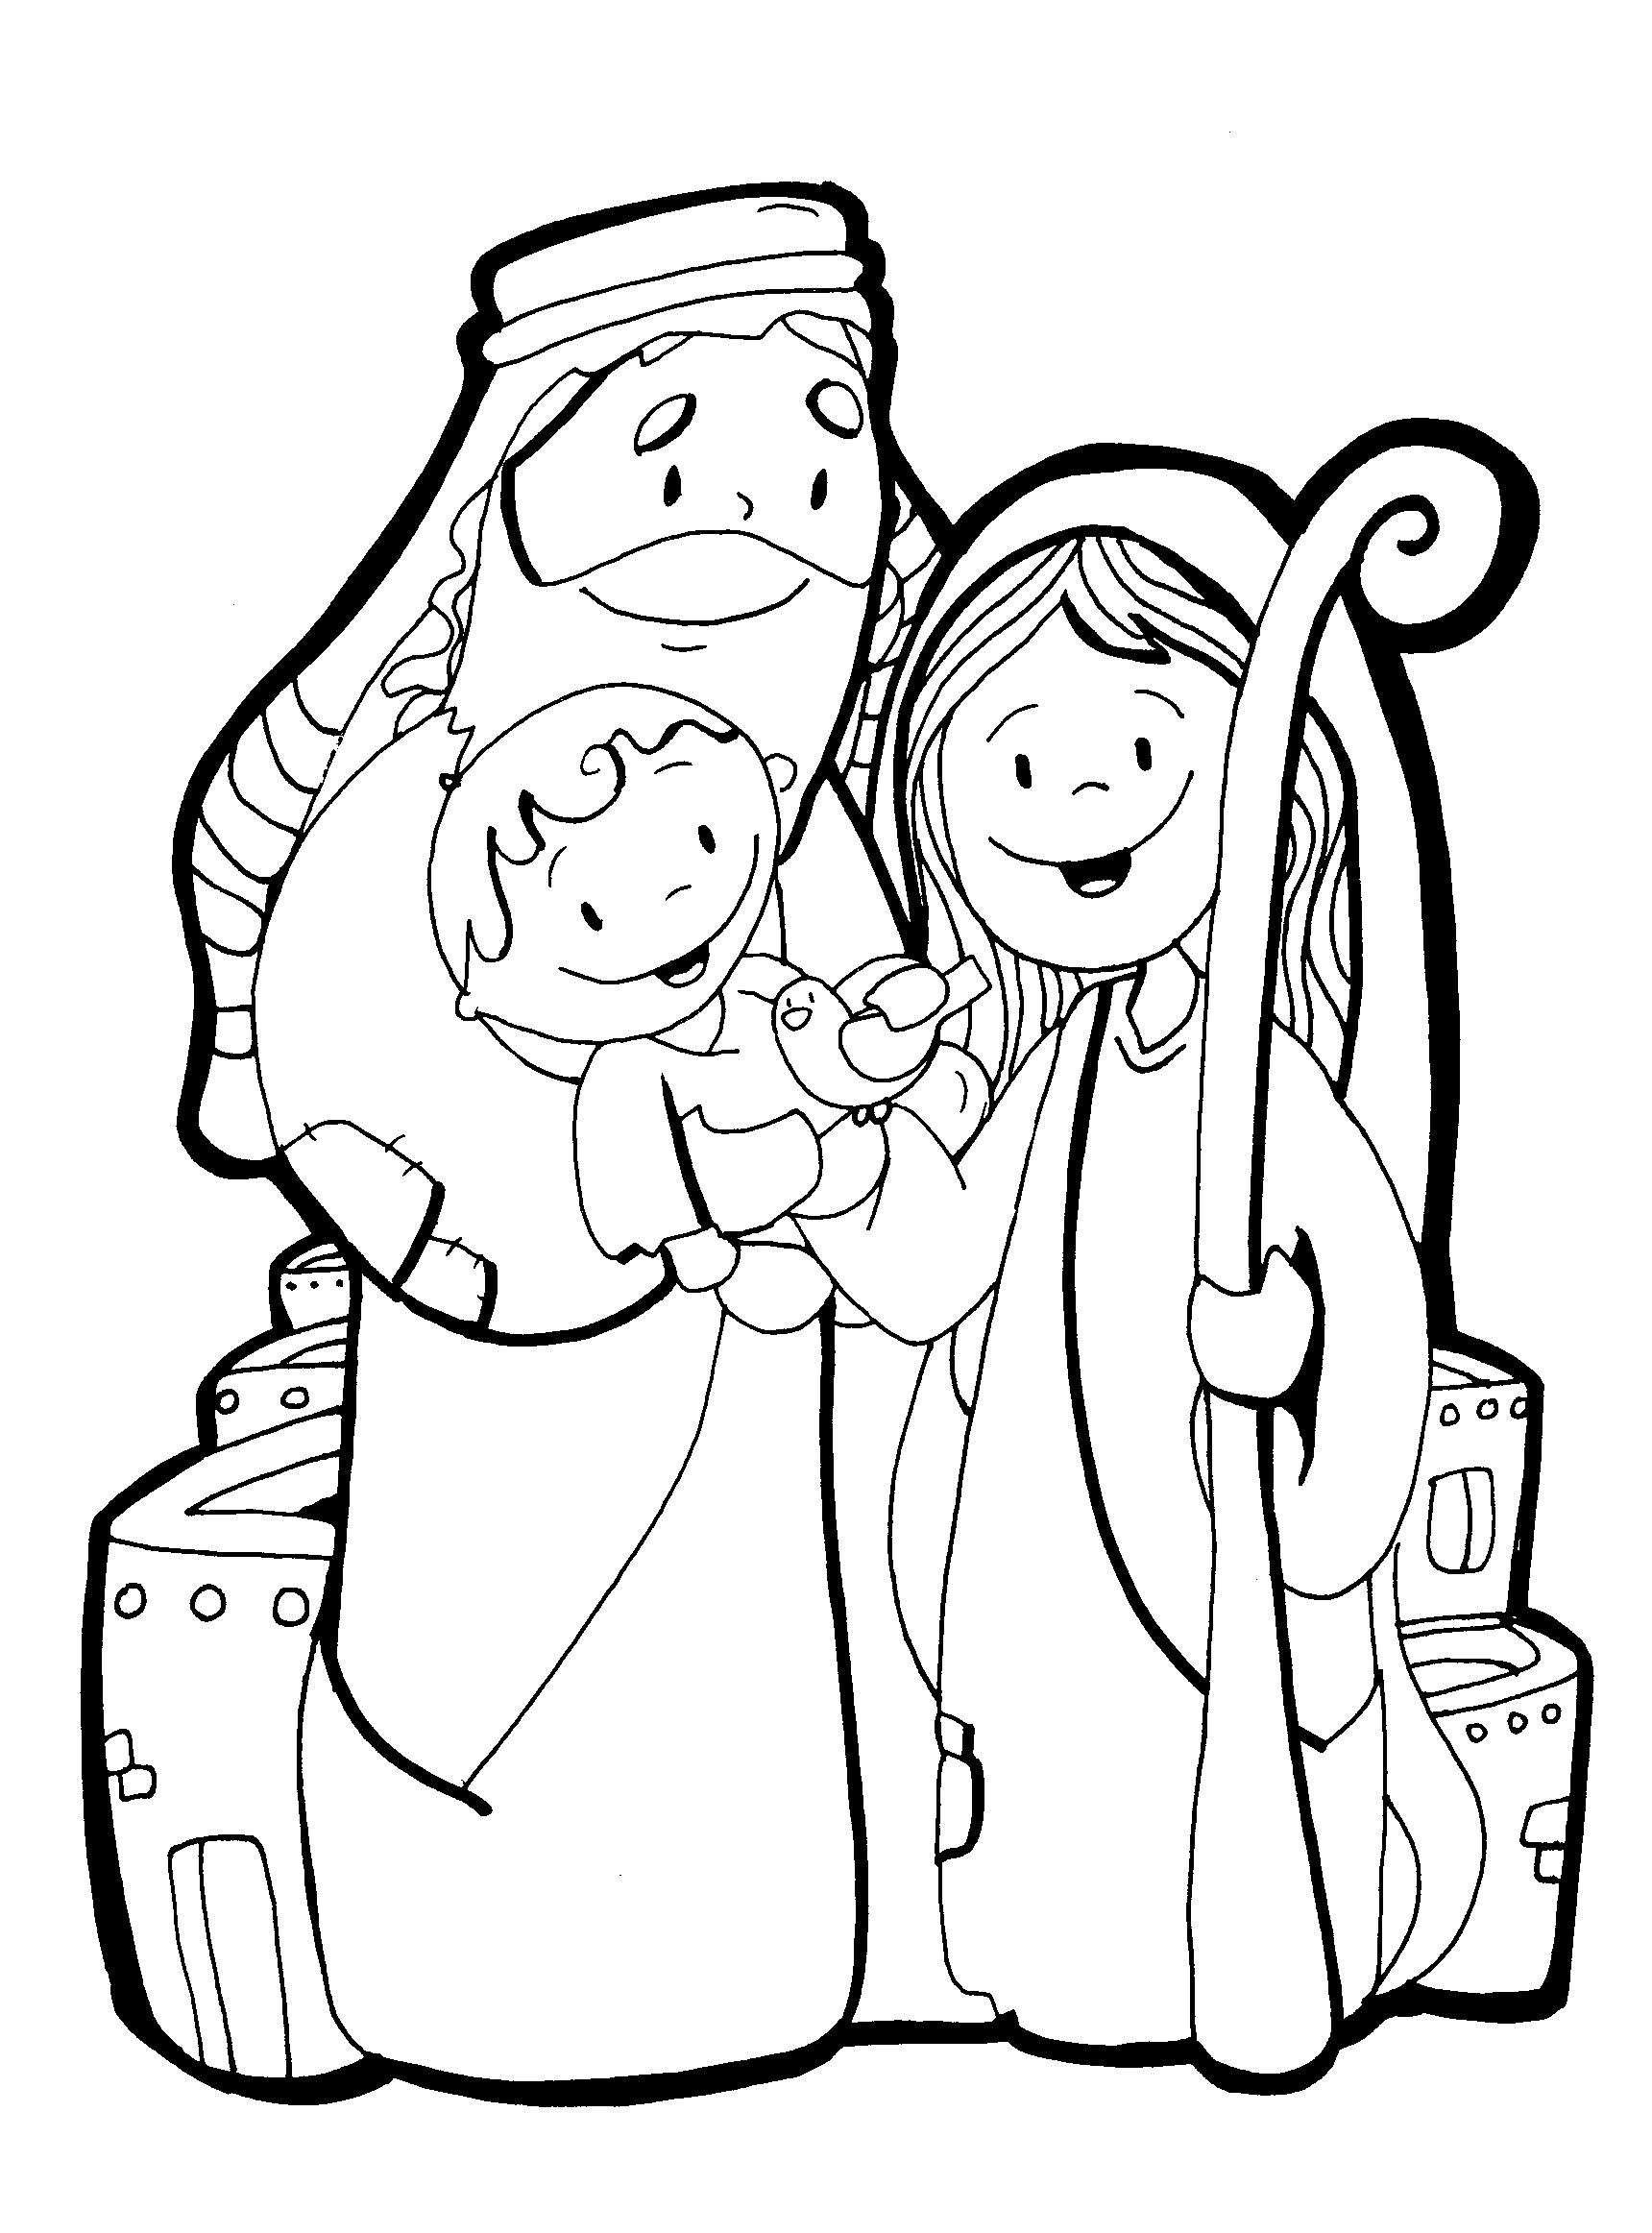 Familia en navidad para dibujar